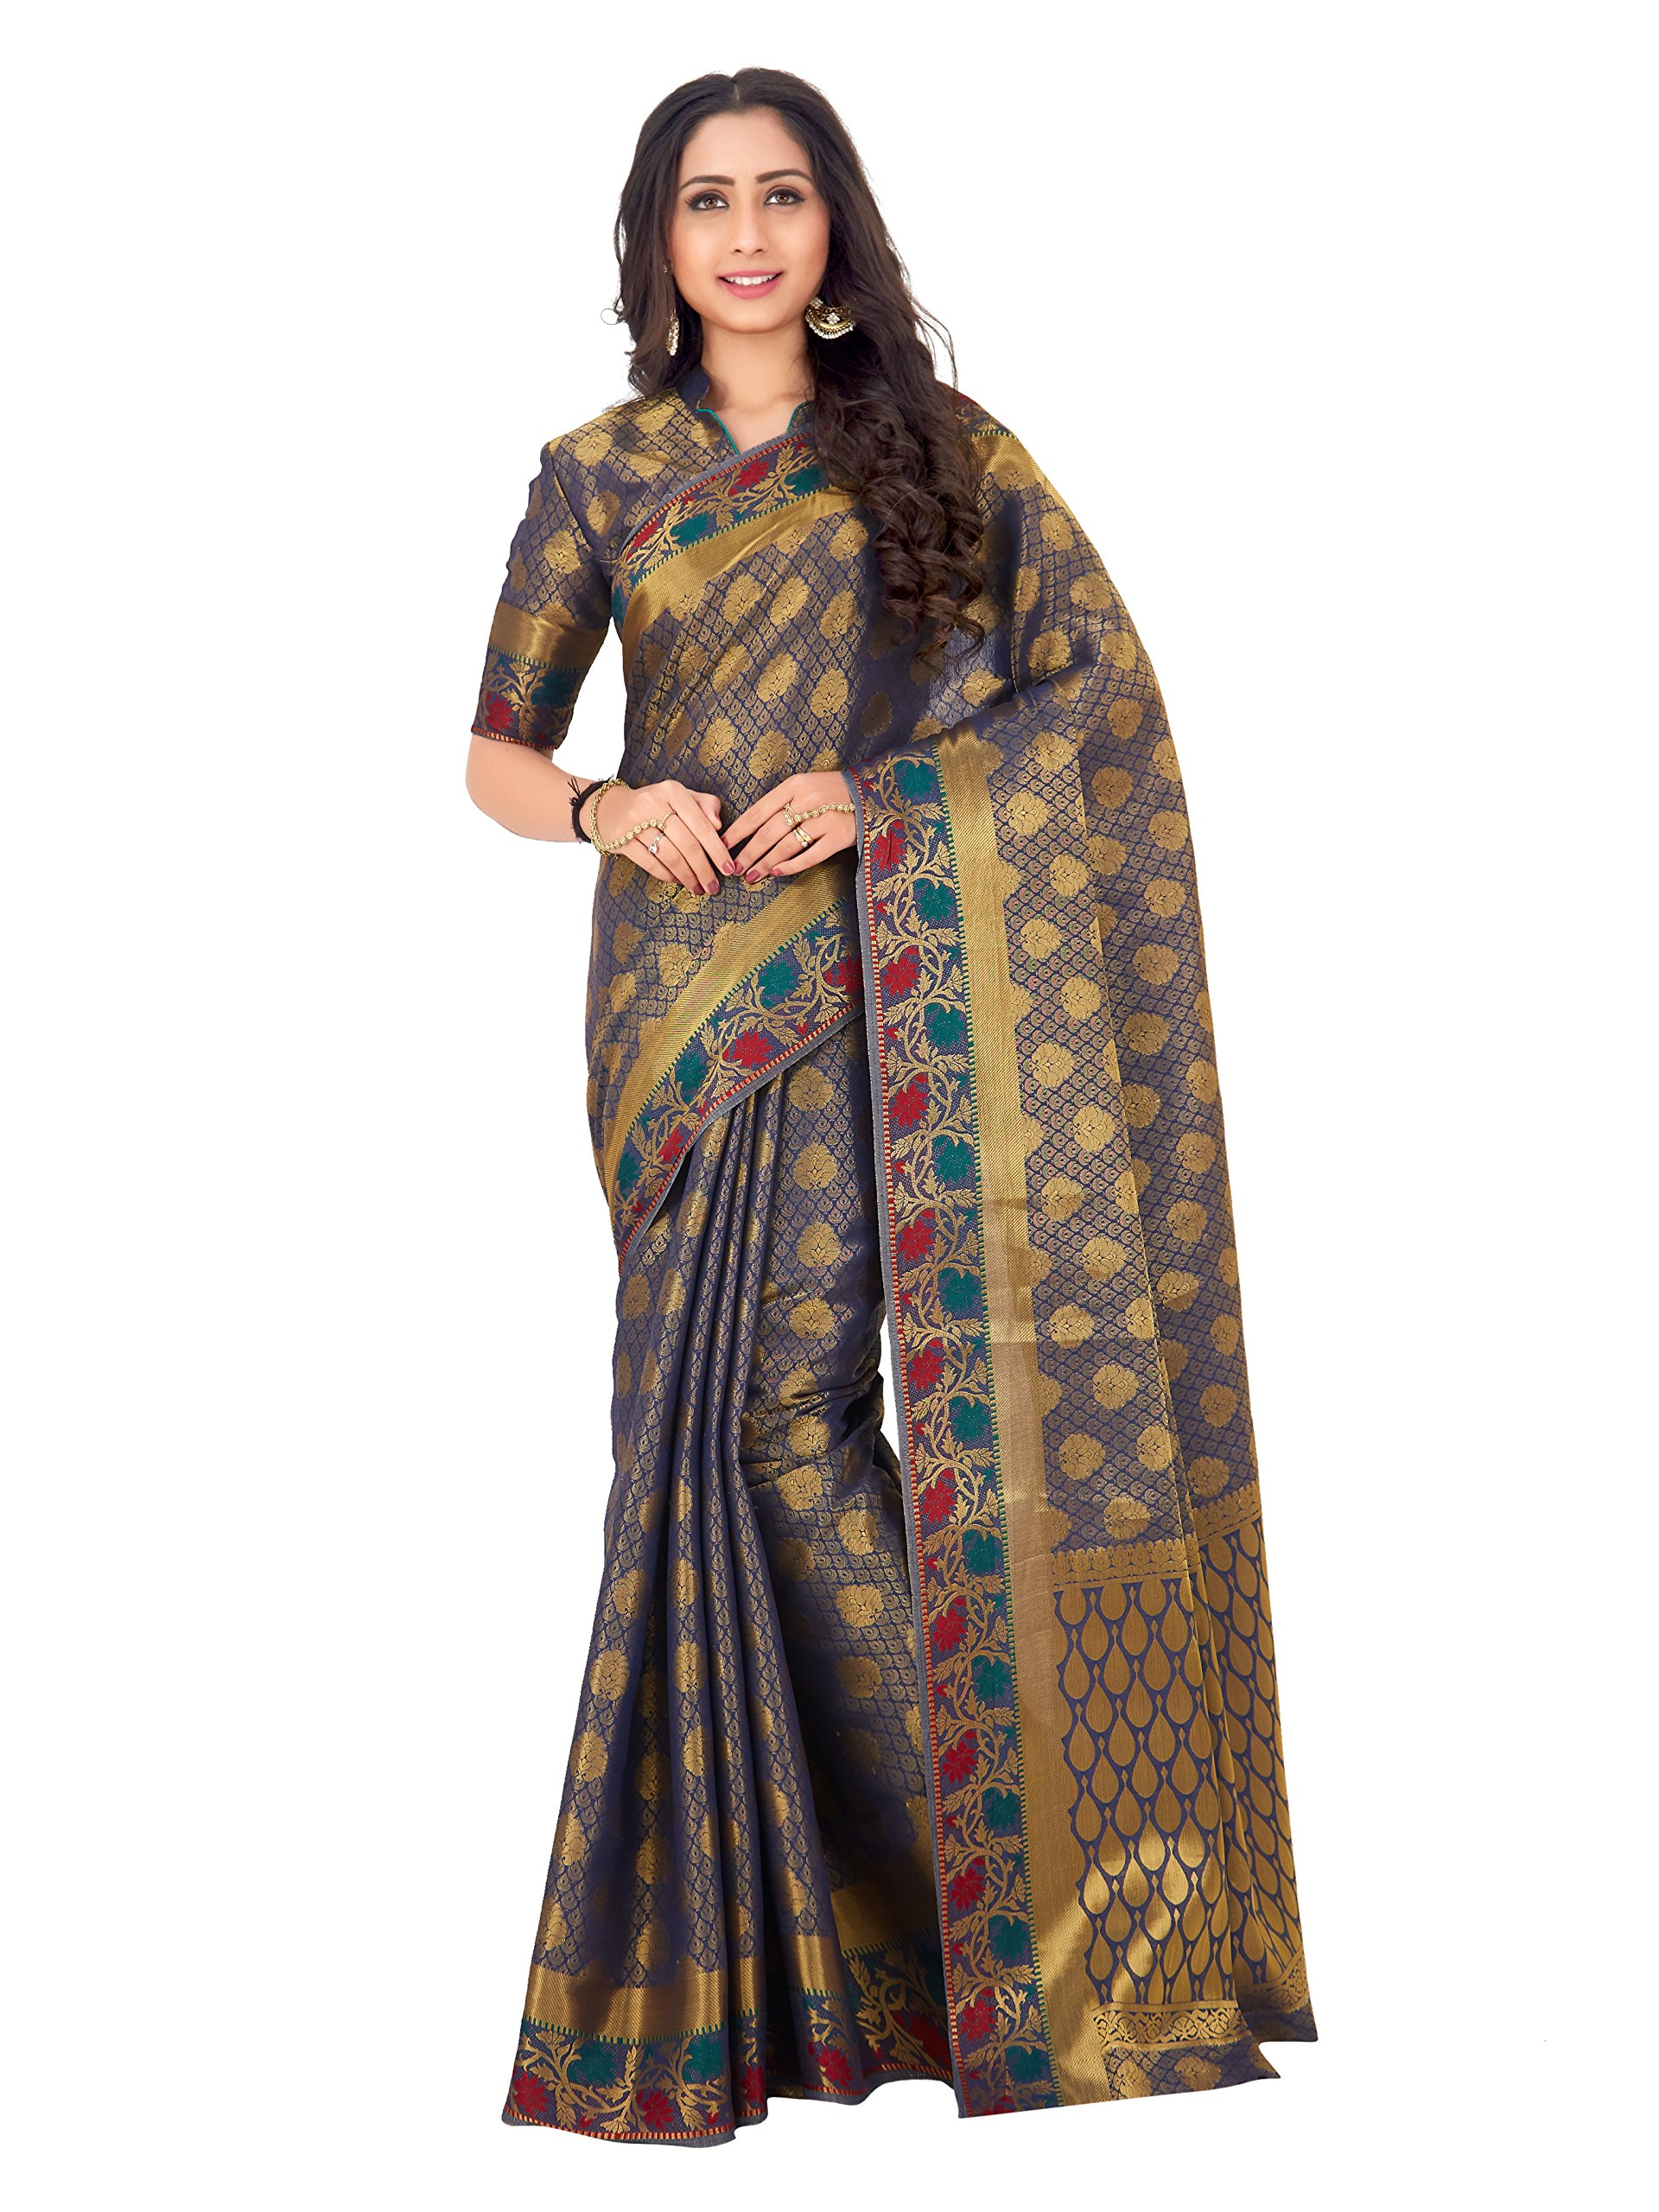 4e8099bfbf99f5 Mimosa By Kupinda Women's Art Silk saree Kanjivaram Style 4169 208 SD -  Ratzz Collection | Best Price Online Shop